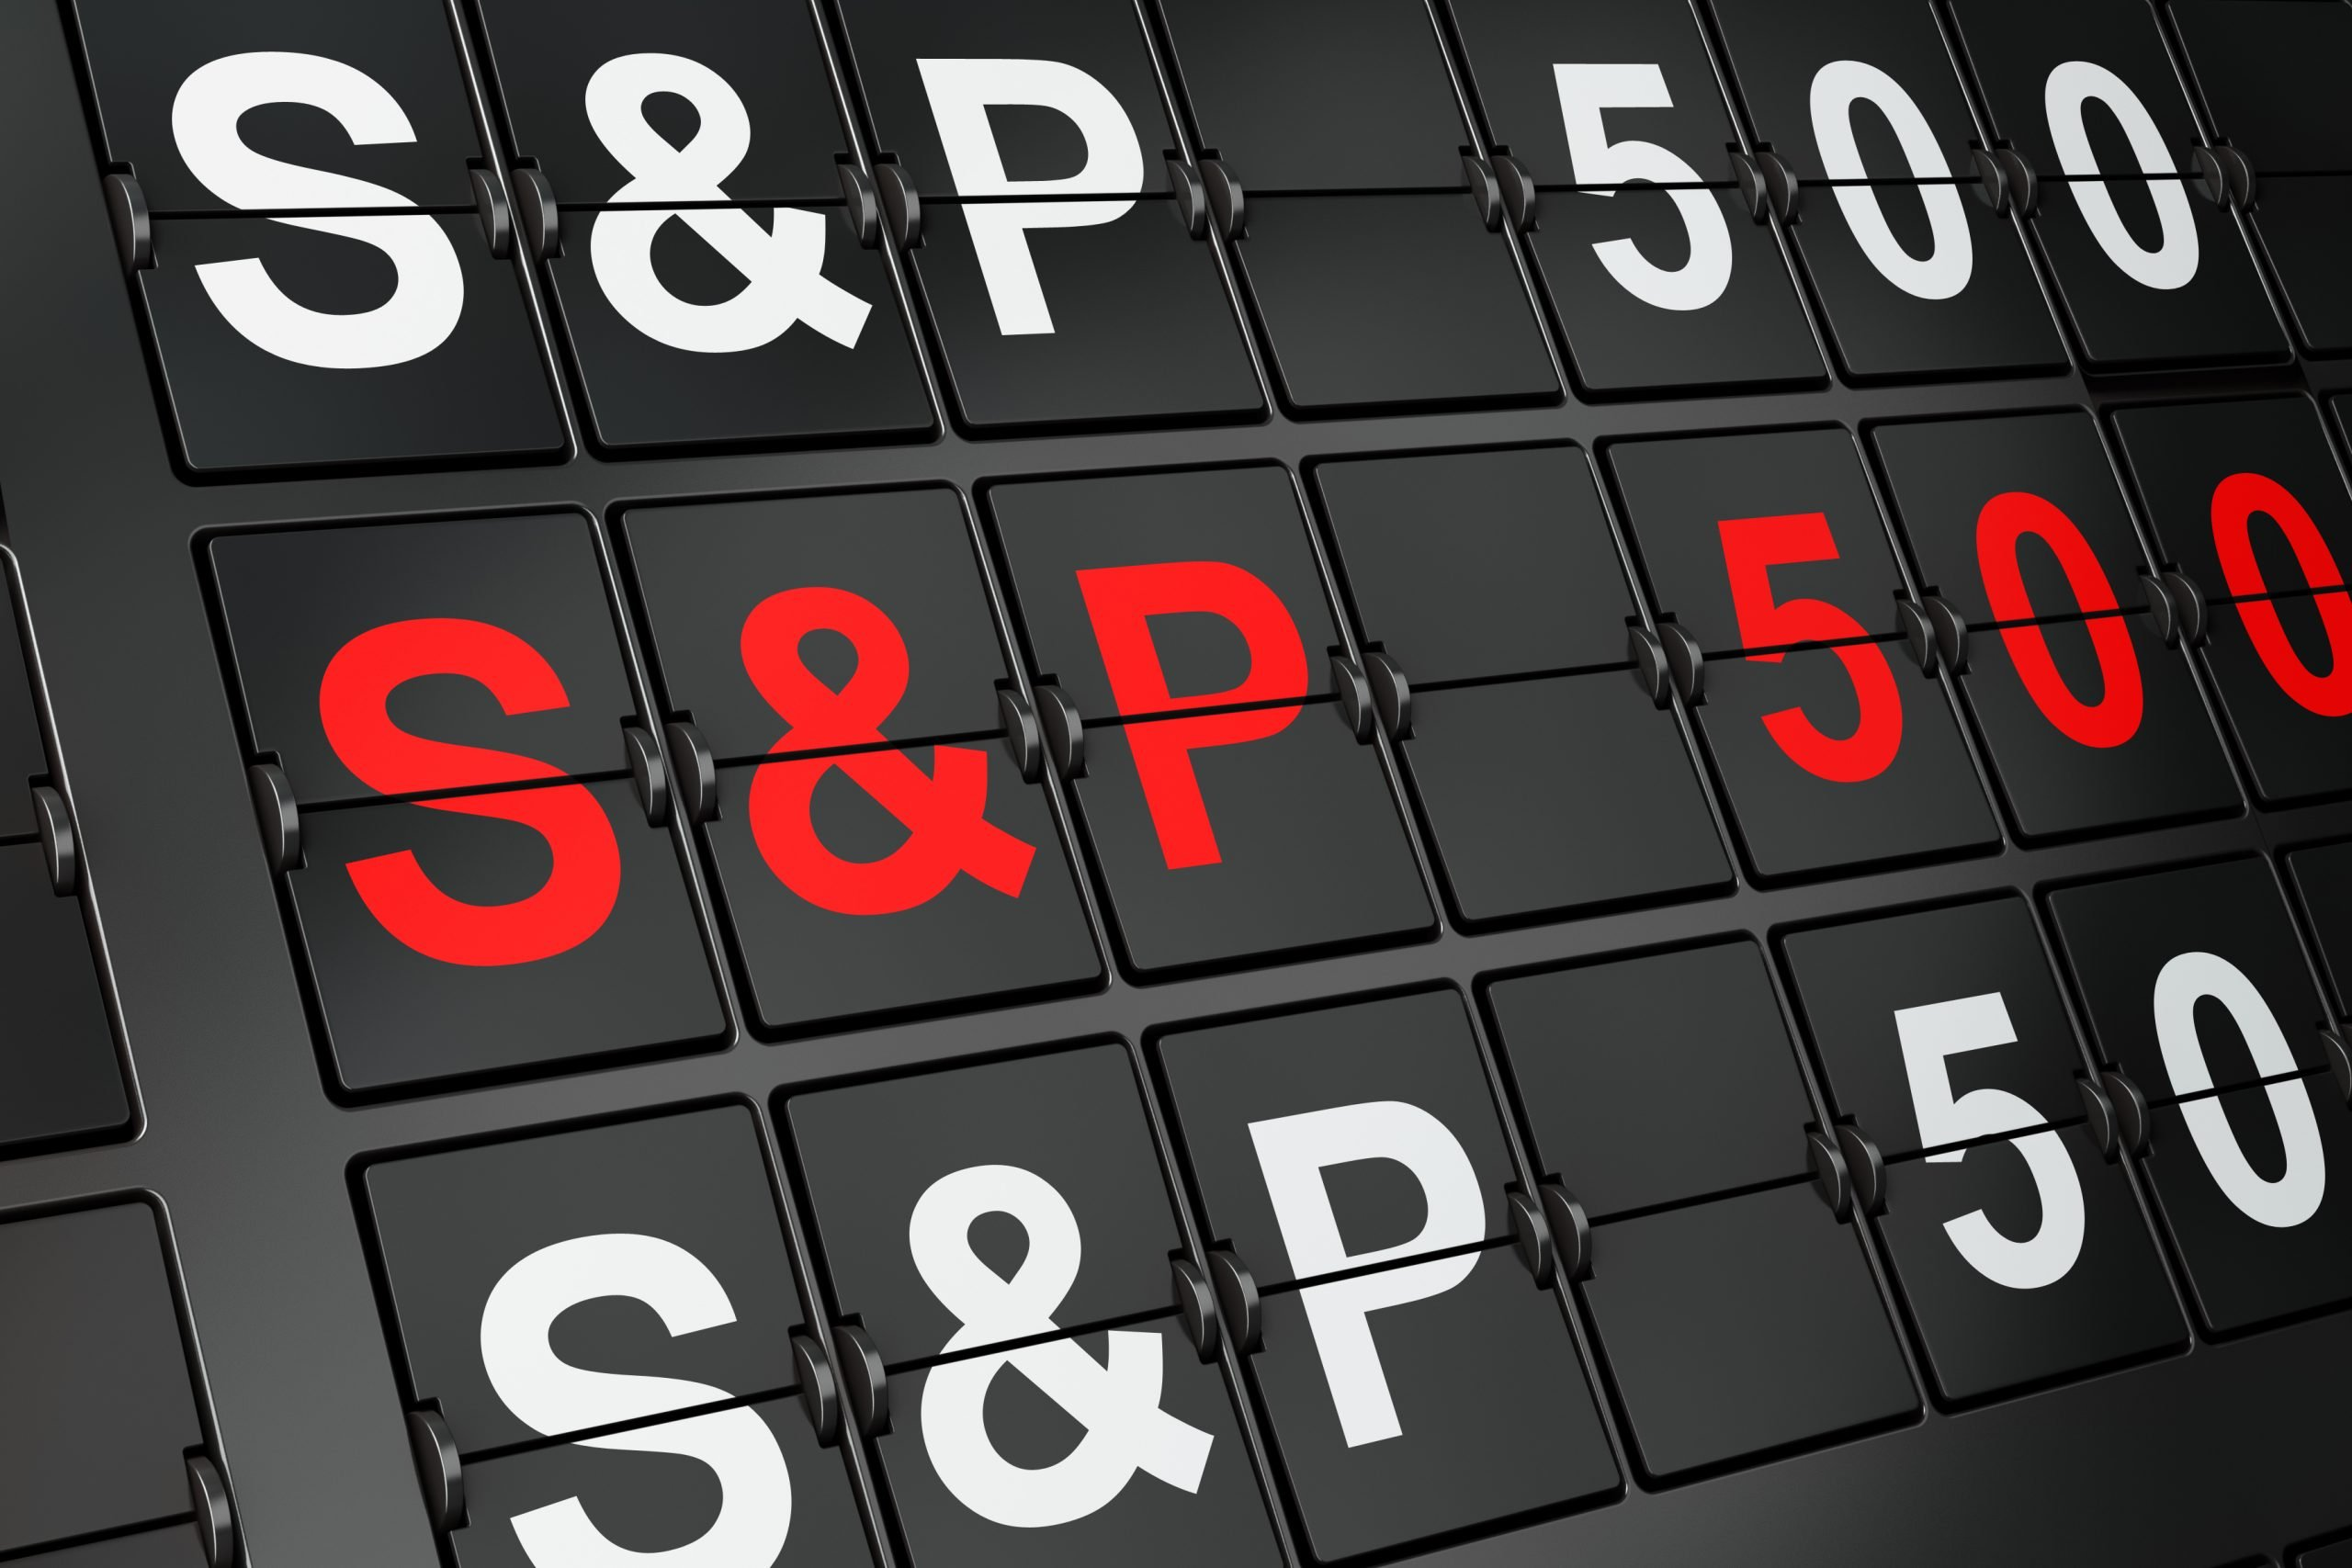 S&P 500 returns 2019